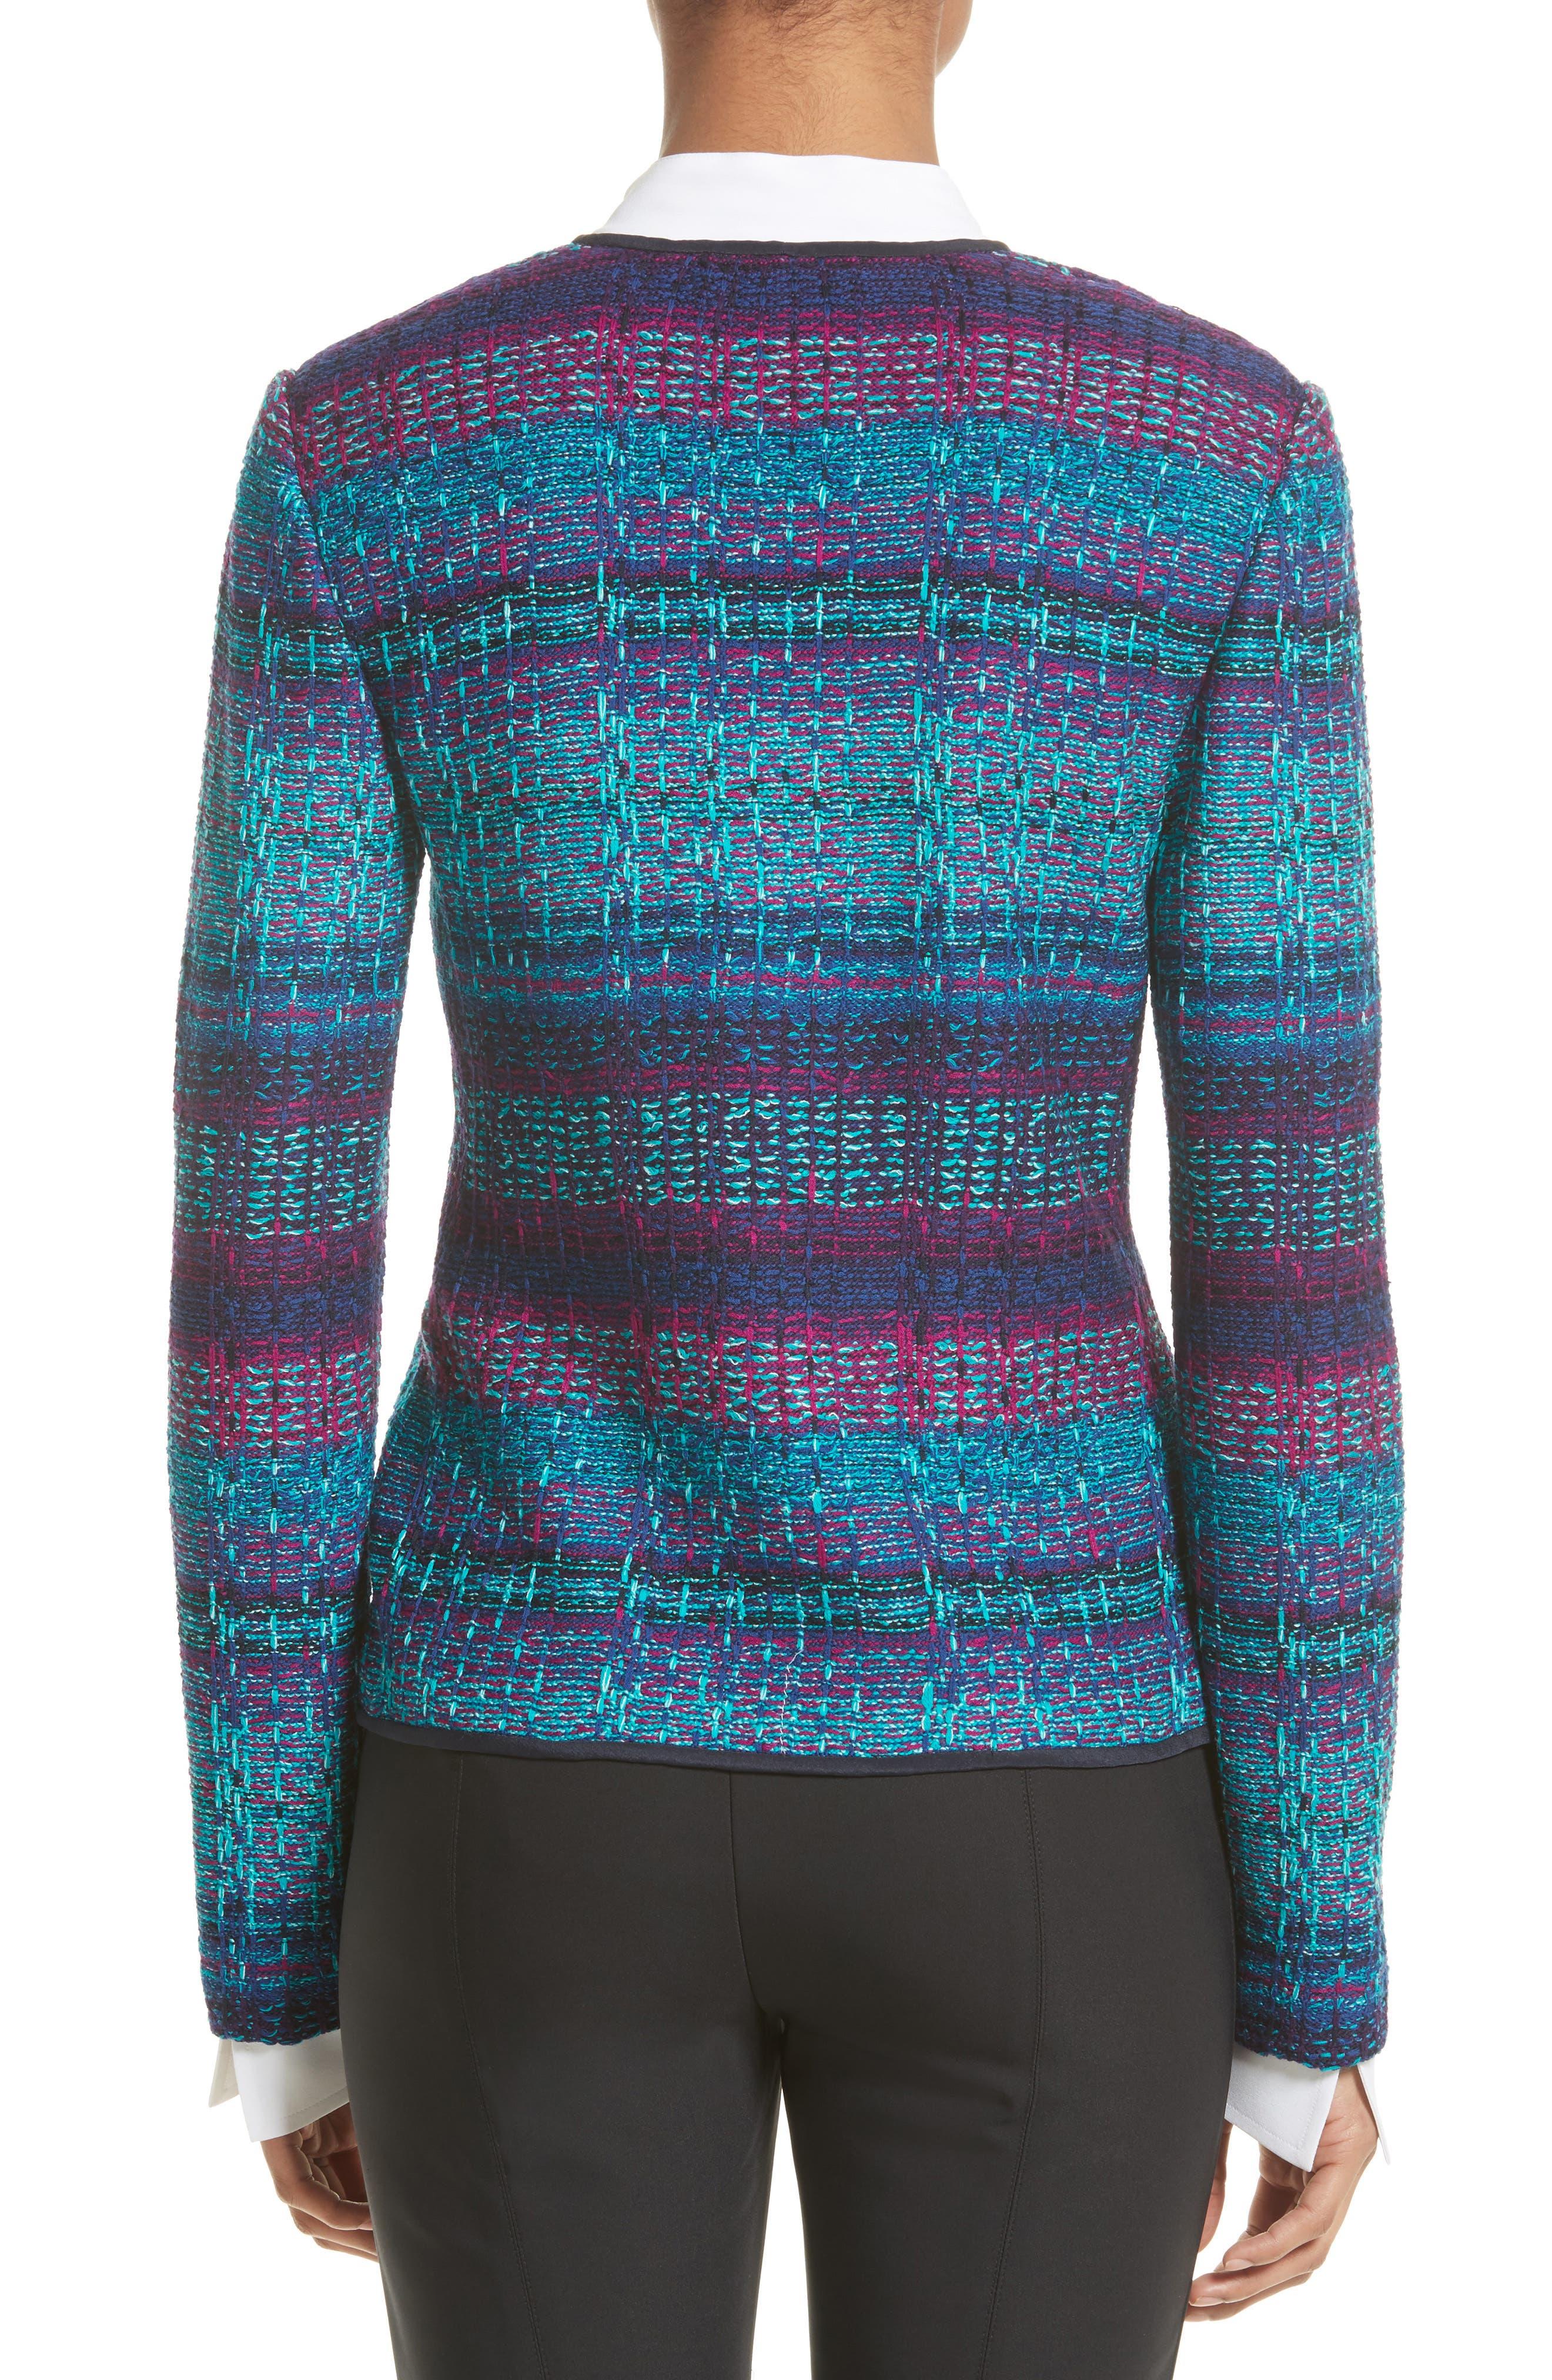 Ellah Knit Jacket,                             Alternate thumbnail 2, color,                             Navy Multi